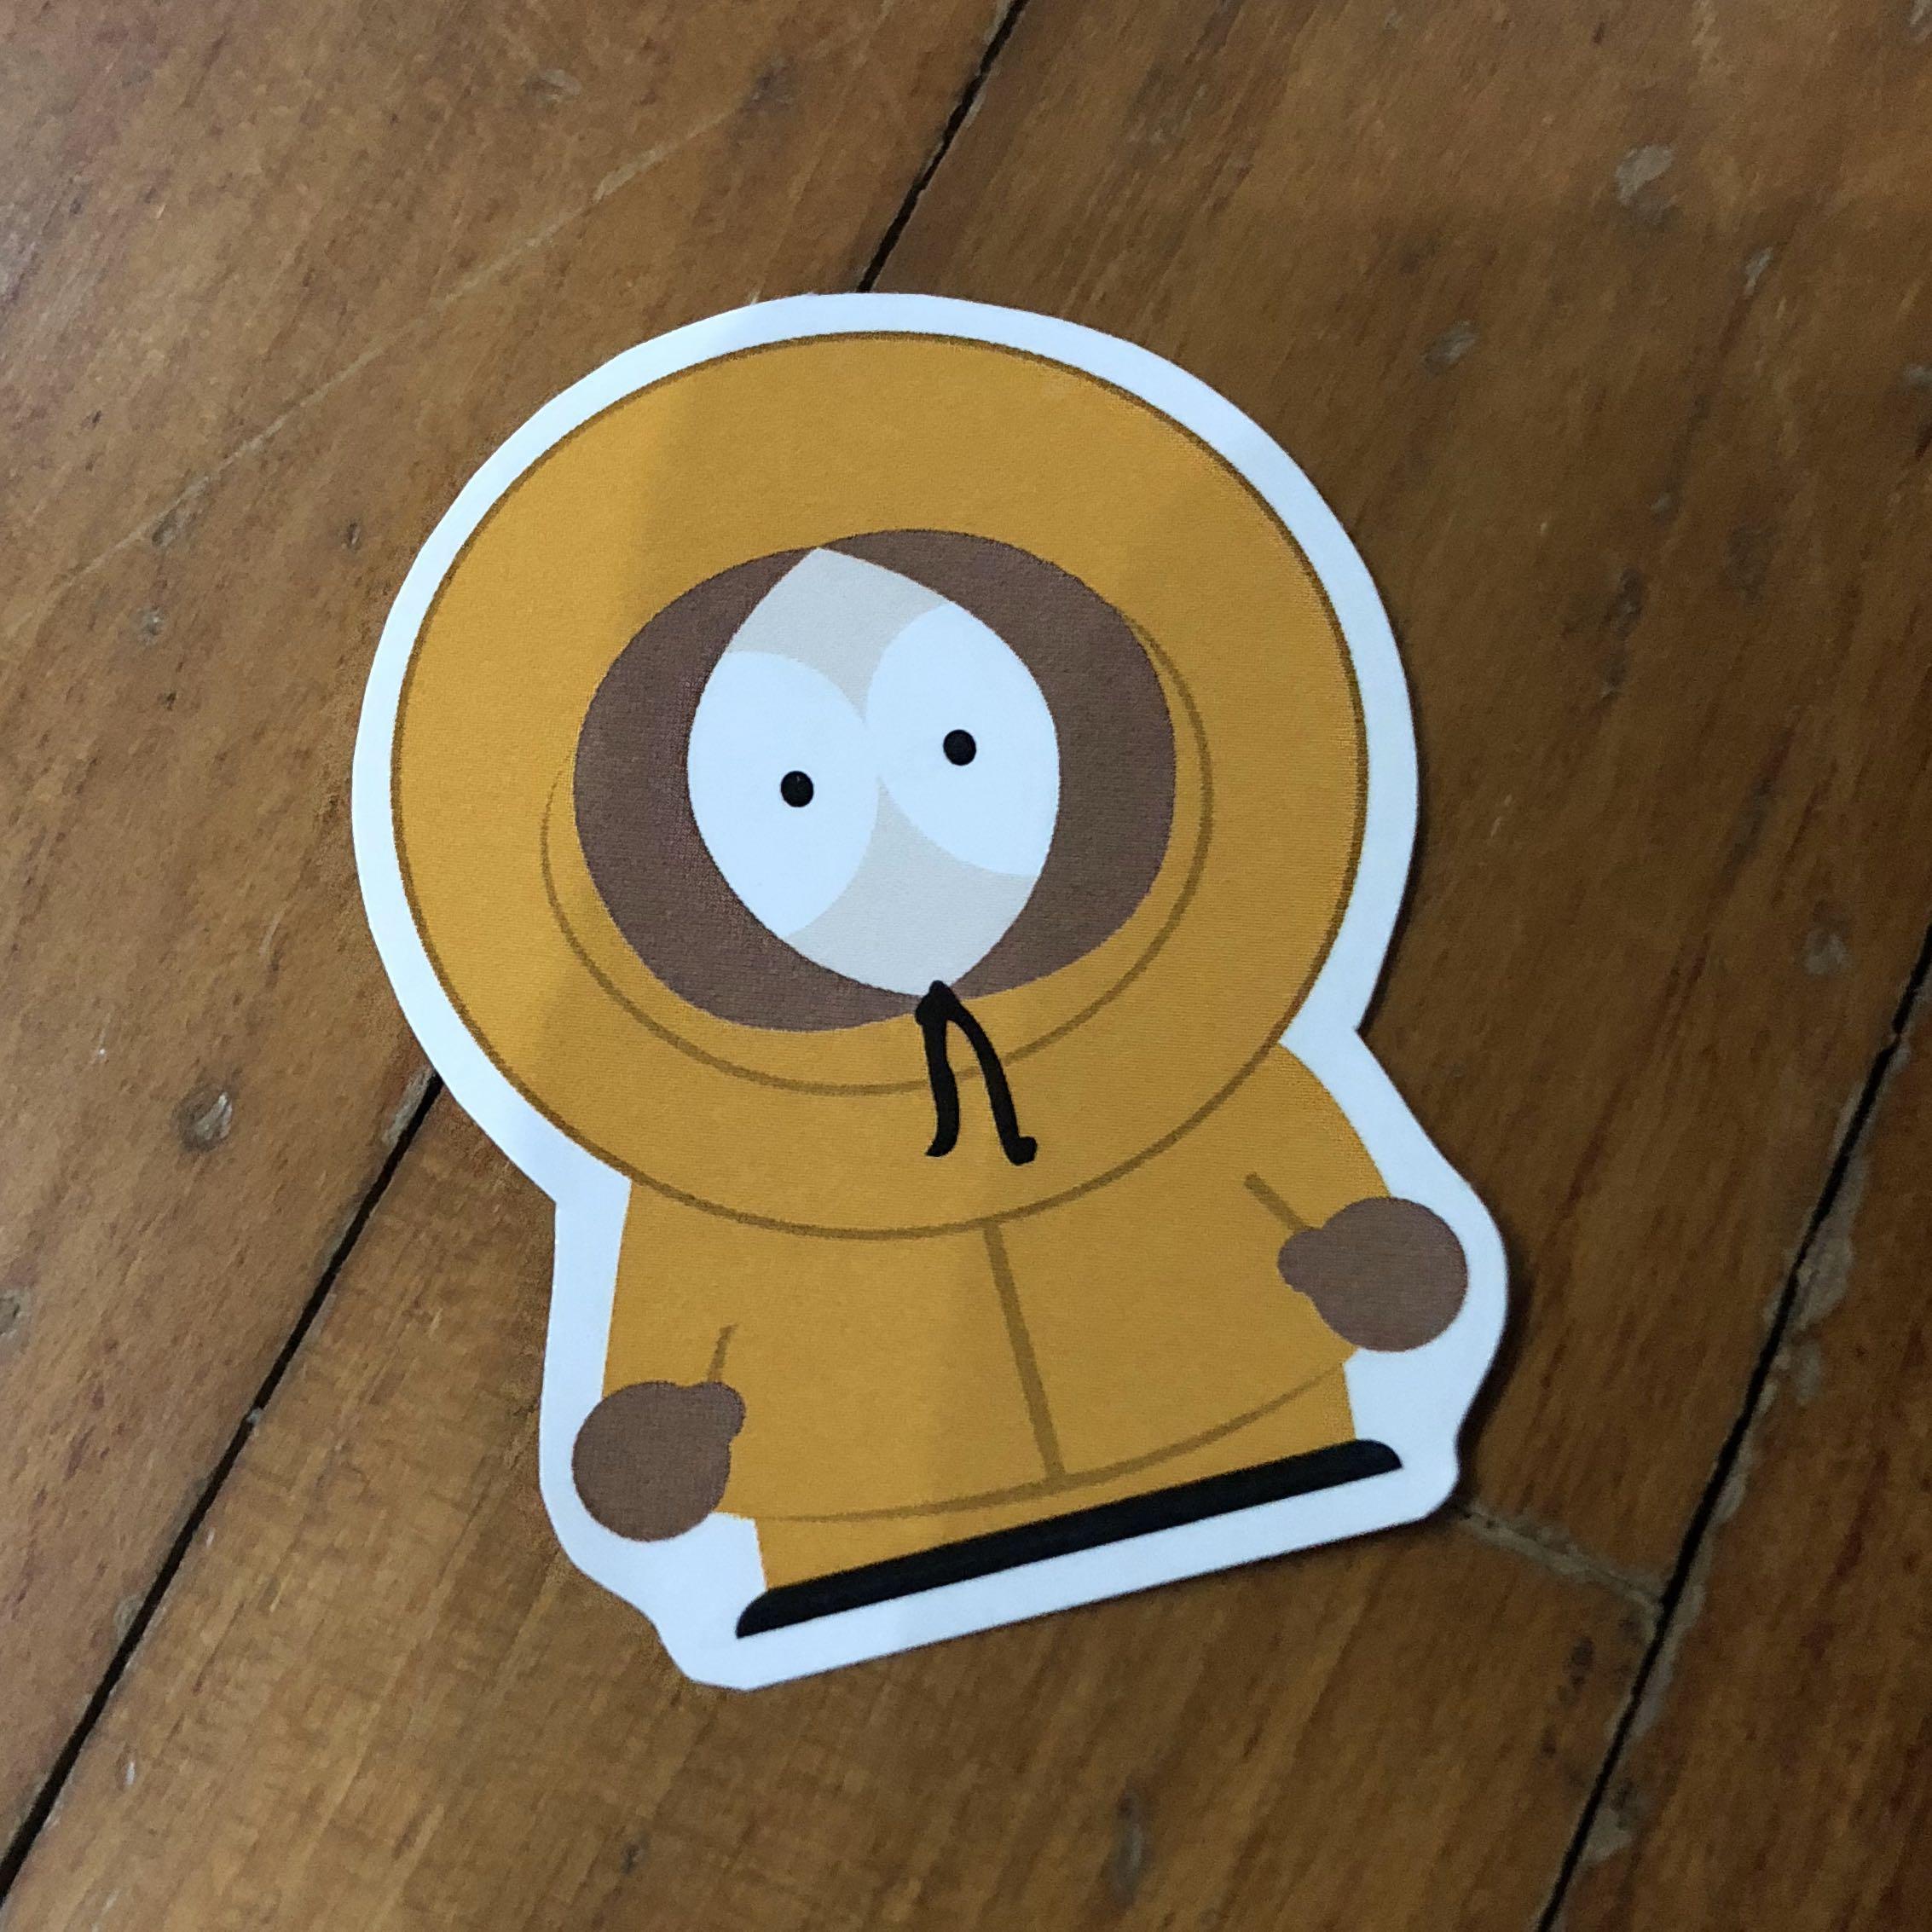 Pop Culture Luggage Laptop Misc Sticker Television TV Series Cartoon South Park Matt Stone Trey Parker Kenny Death Character